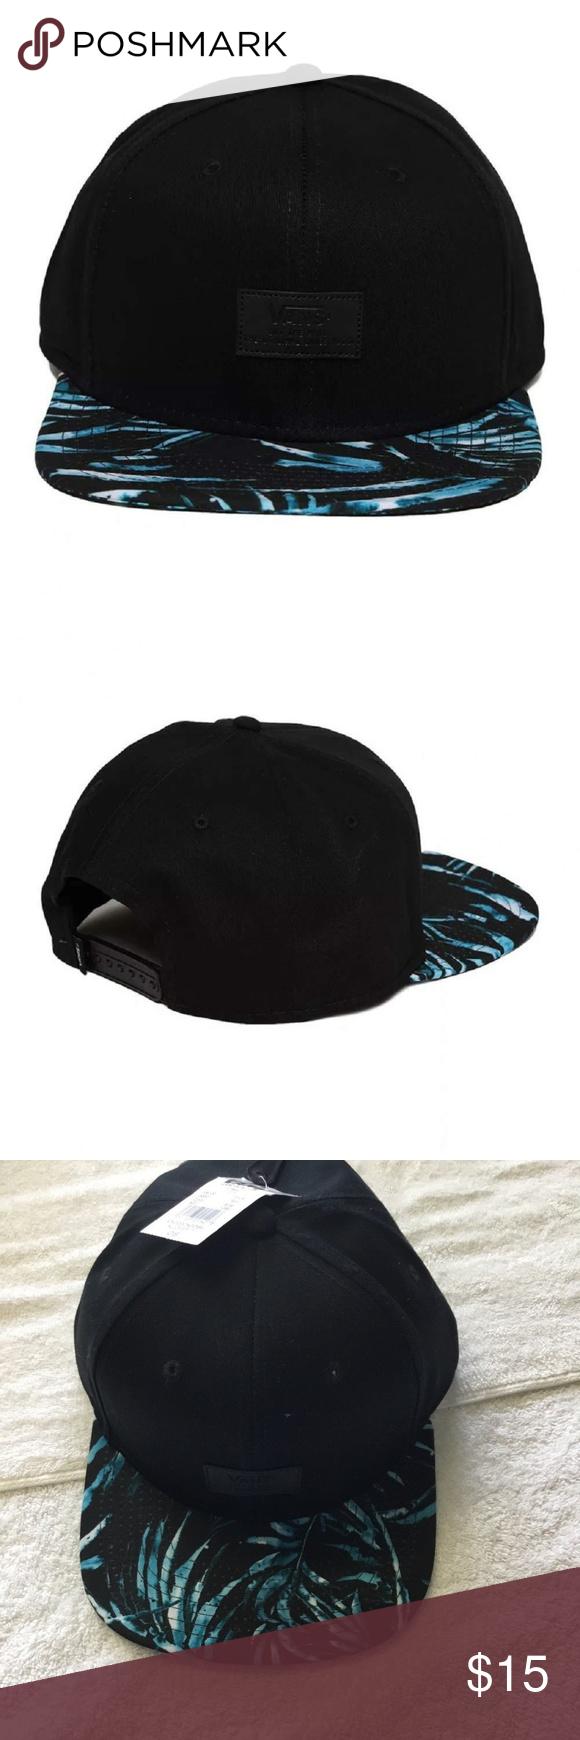 de62d36467413 Vans Men s All Over It Snapback Hat Black HAT Vans Men s All Over It Snapback  Hat Black One-Size VN0000X2O8V NWT